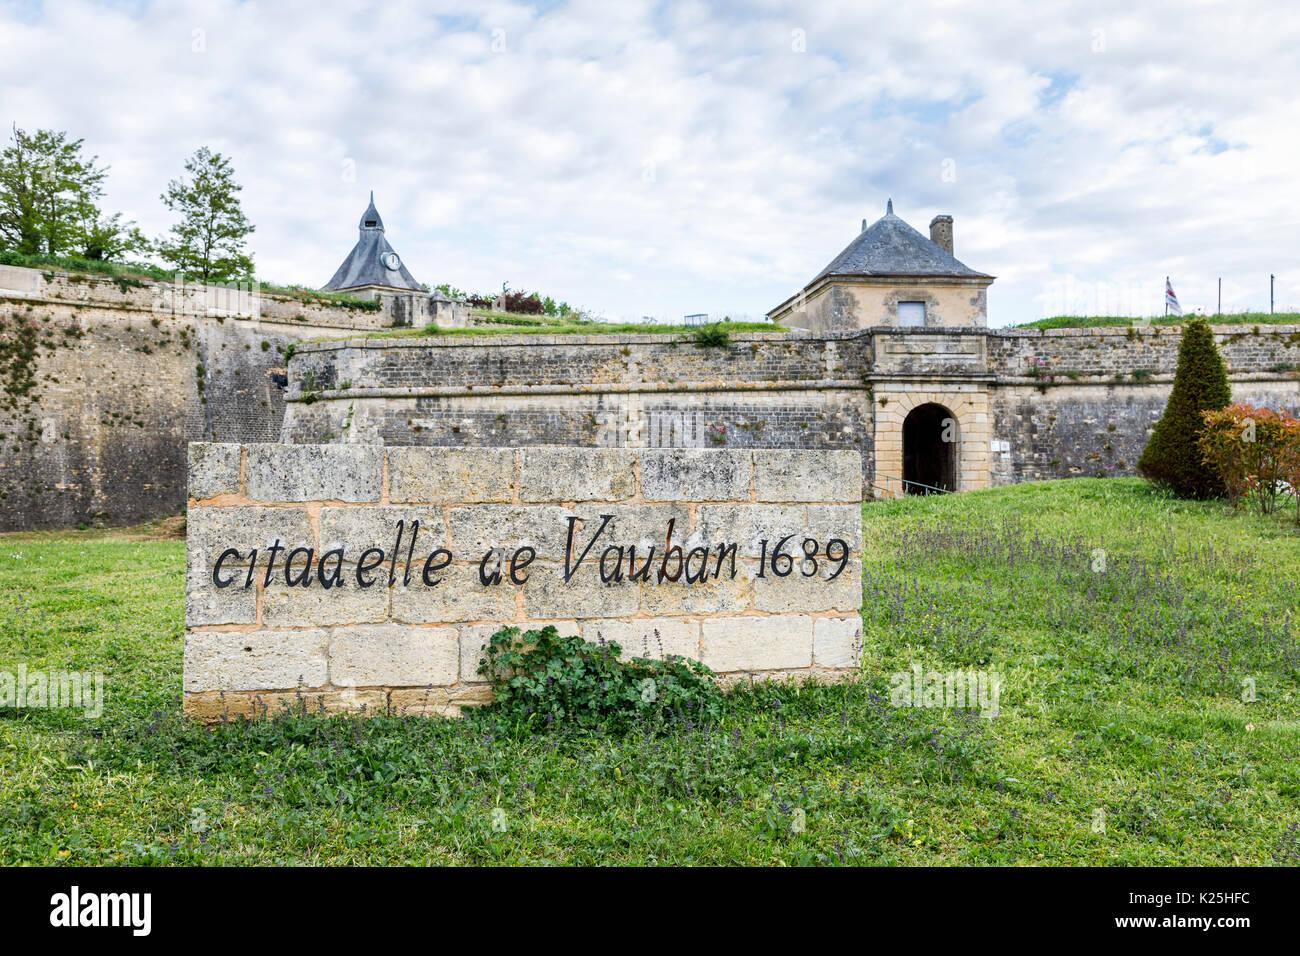 Citadel Of Blaye Citadelle De Vauban In A Commune And Subprefecture The Gironde Department Nouvelle Aquitaine Southwestern France